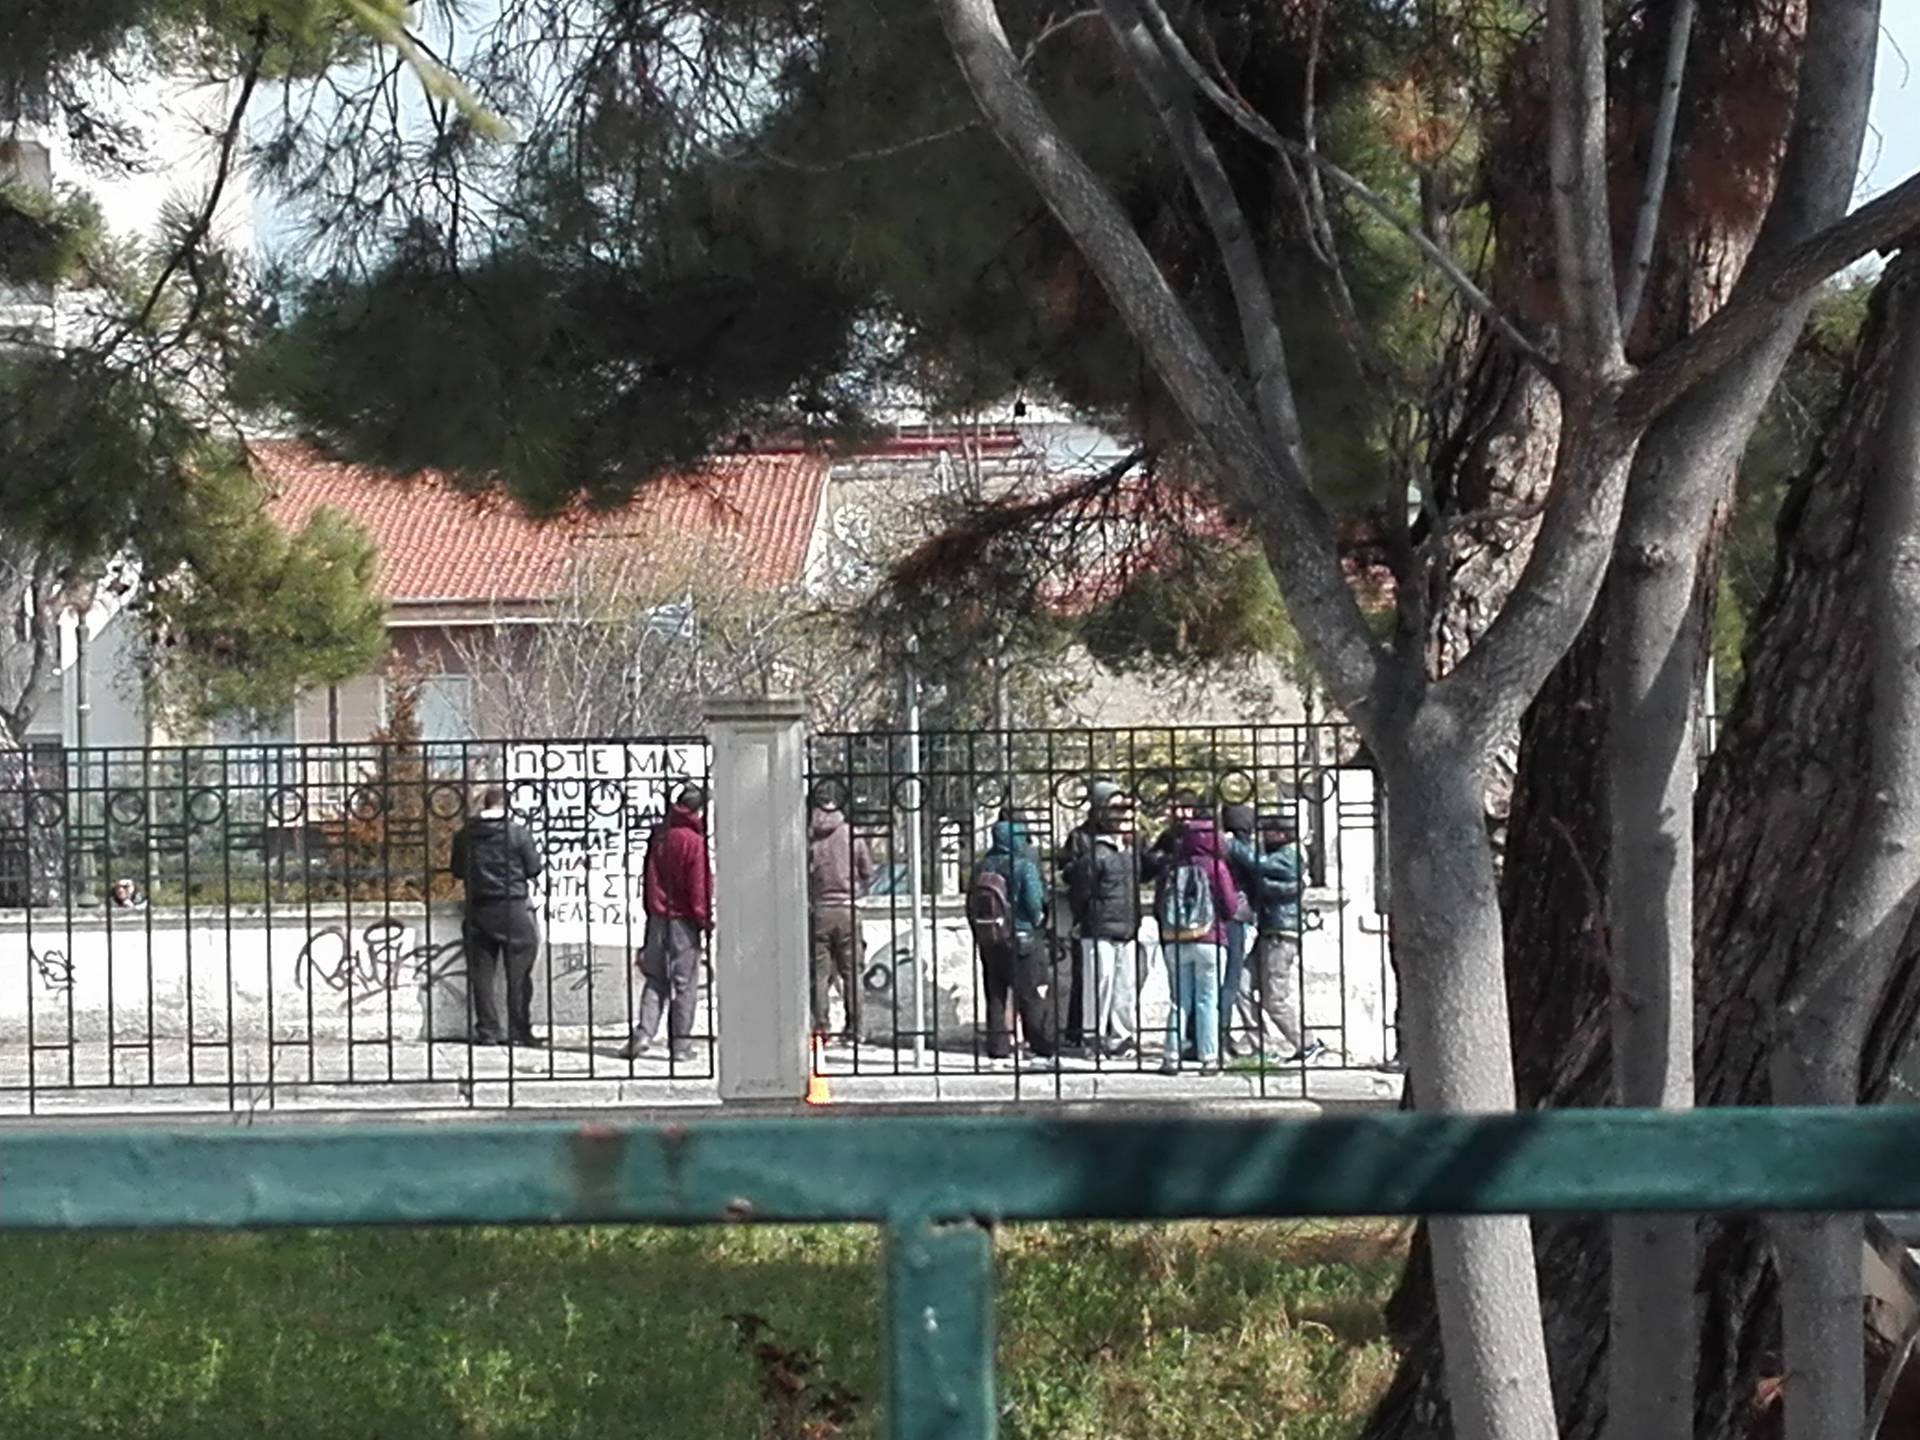 kozan.gr: Μια μικρή ομάδα νεαρών στην Στρατολογία Κοζάνης, «κρέμασε» πανό στήριξης στον ολικό αρνητή στράτευσης Β.Π. – Το κείμενο δήλωσής του (Φωτογραφίες)